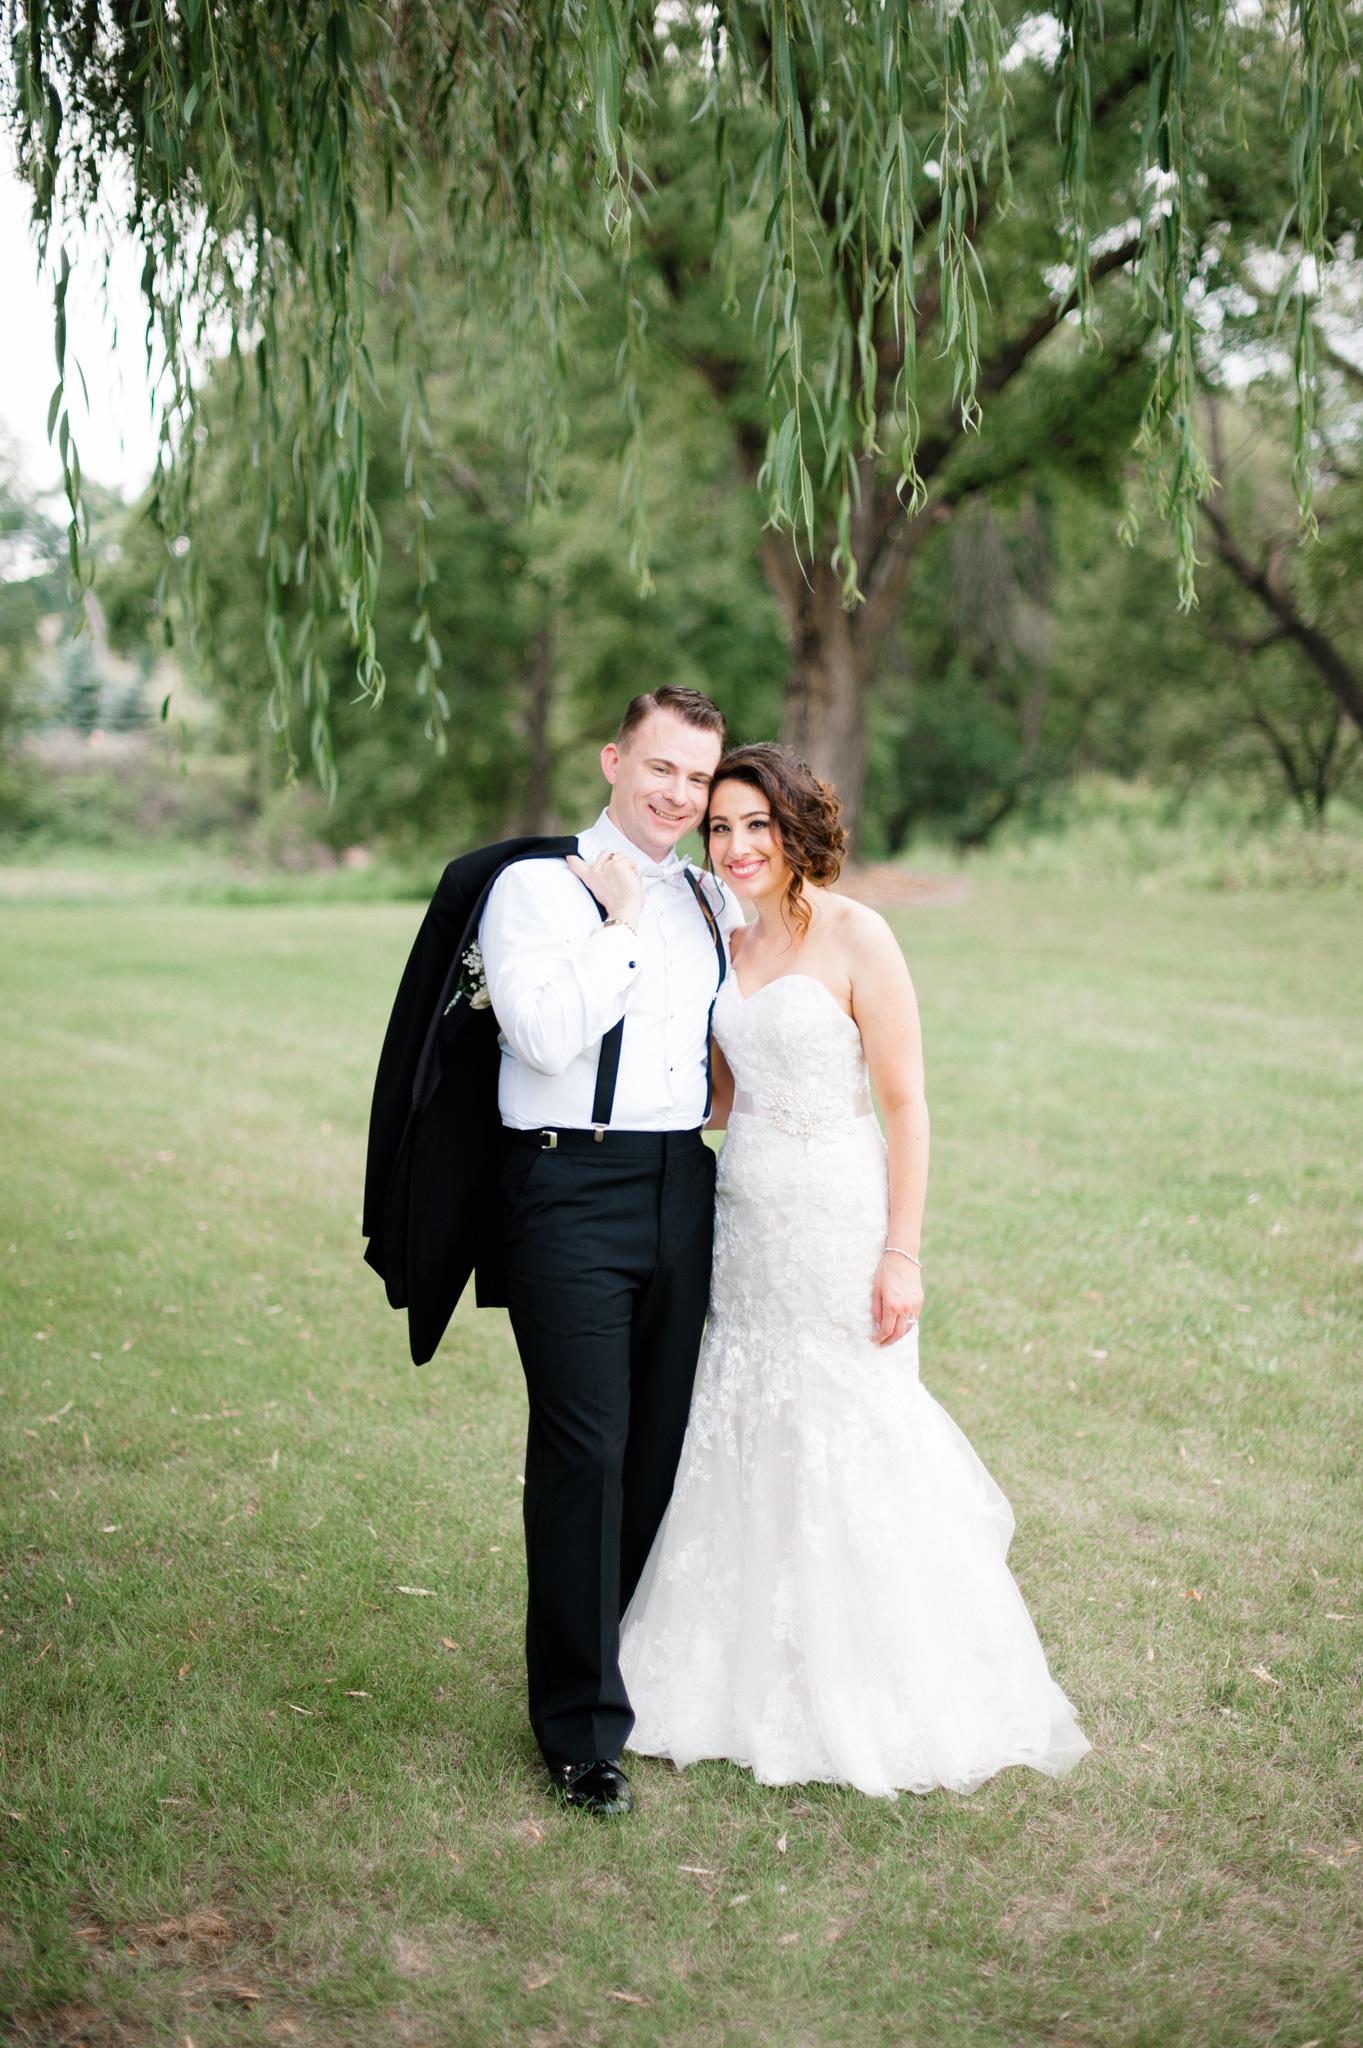 Megan and Noah - Jeff Sampson Weddings